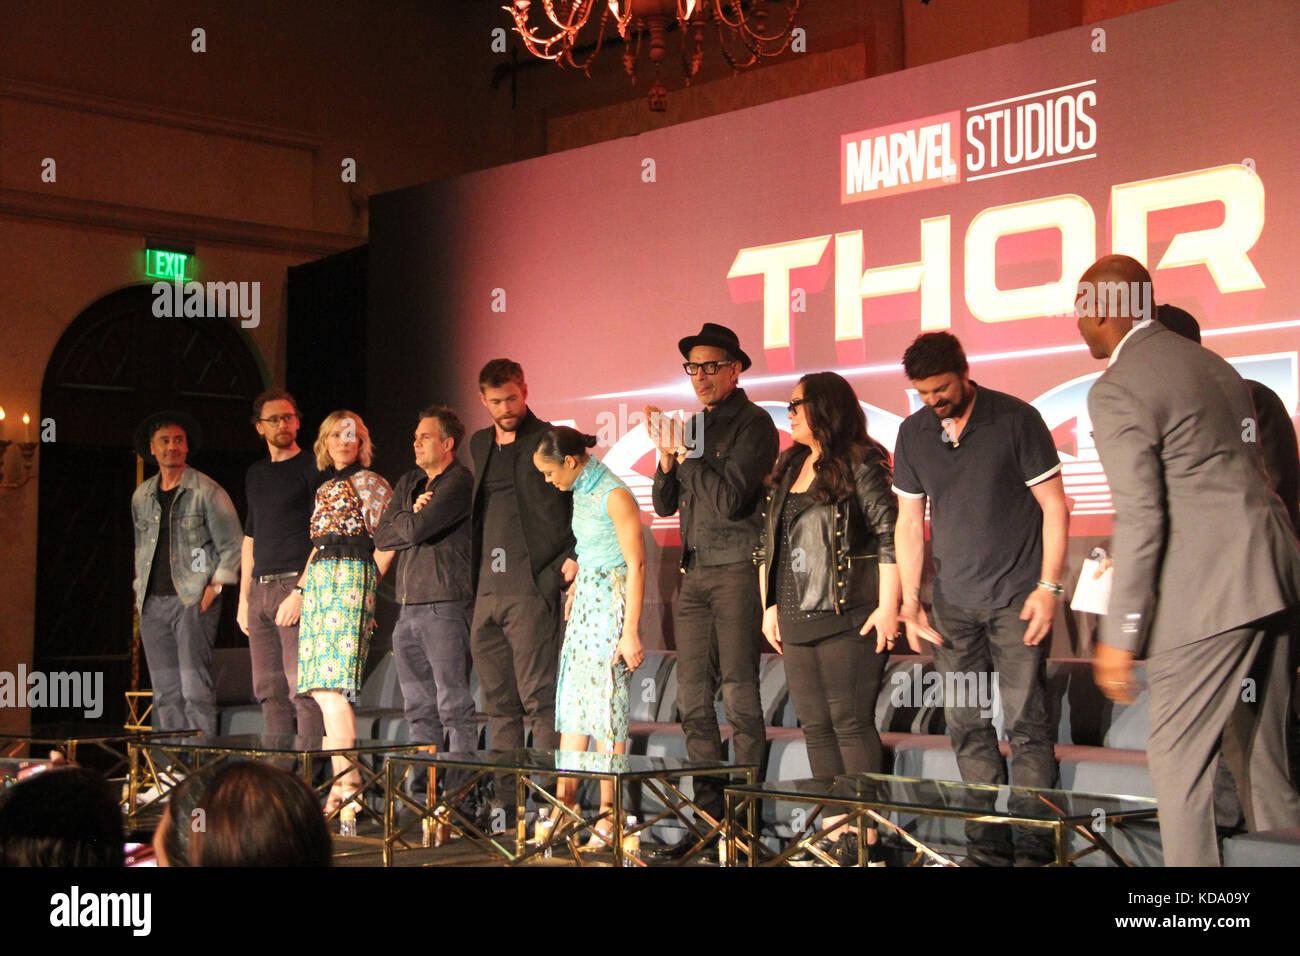 Los Angeles, USA. 11th Oct, 2017. Taika Waititi, Tom Hiddleston, Cate Blanchett, Mark Ruffalo, Chris Hemsworth, - Stock Image